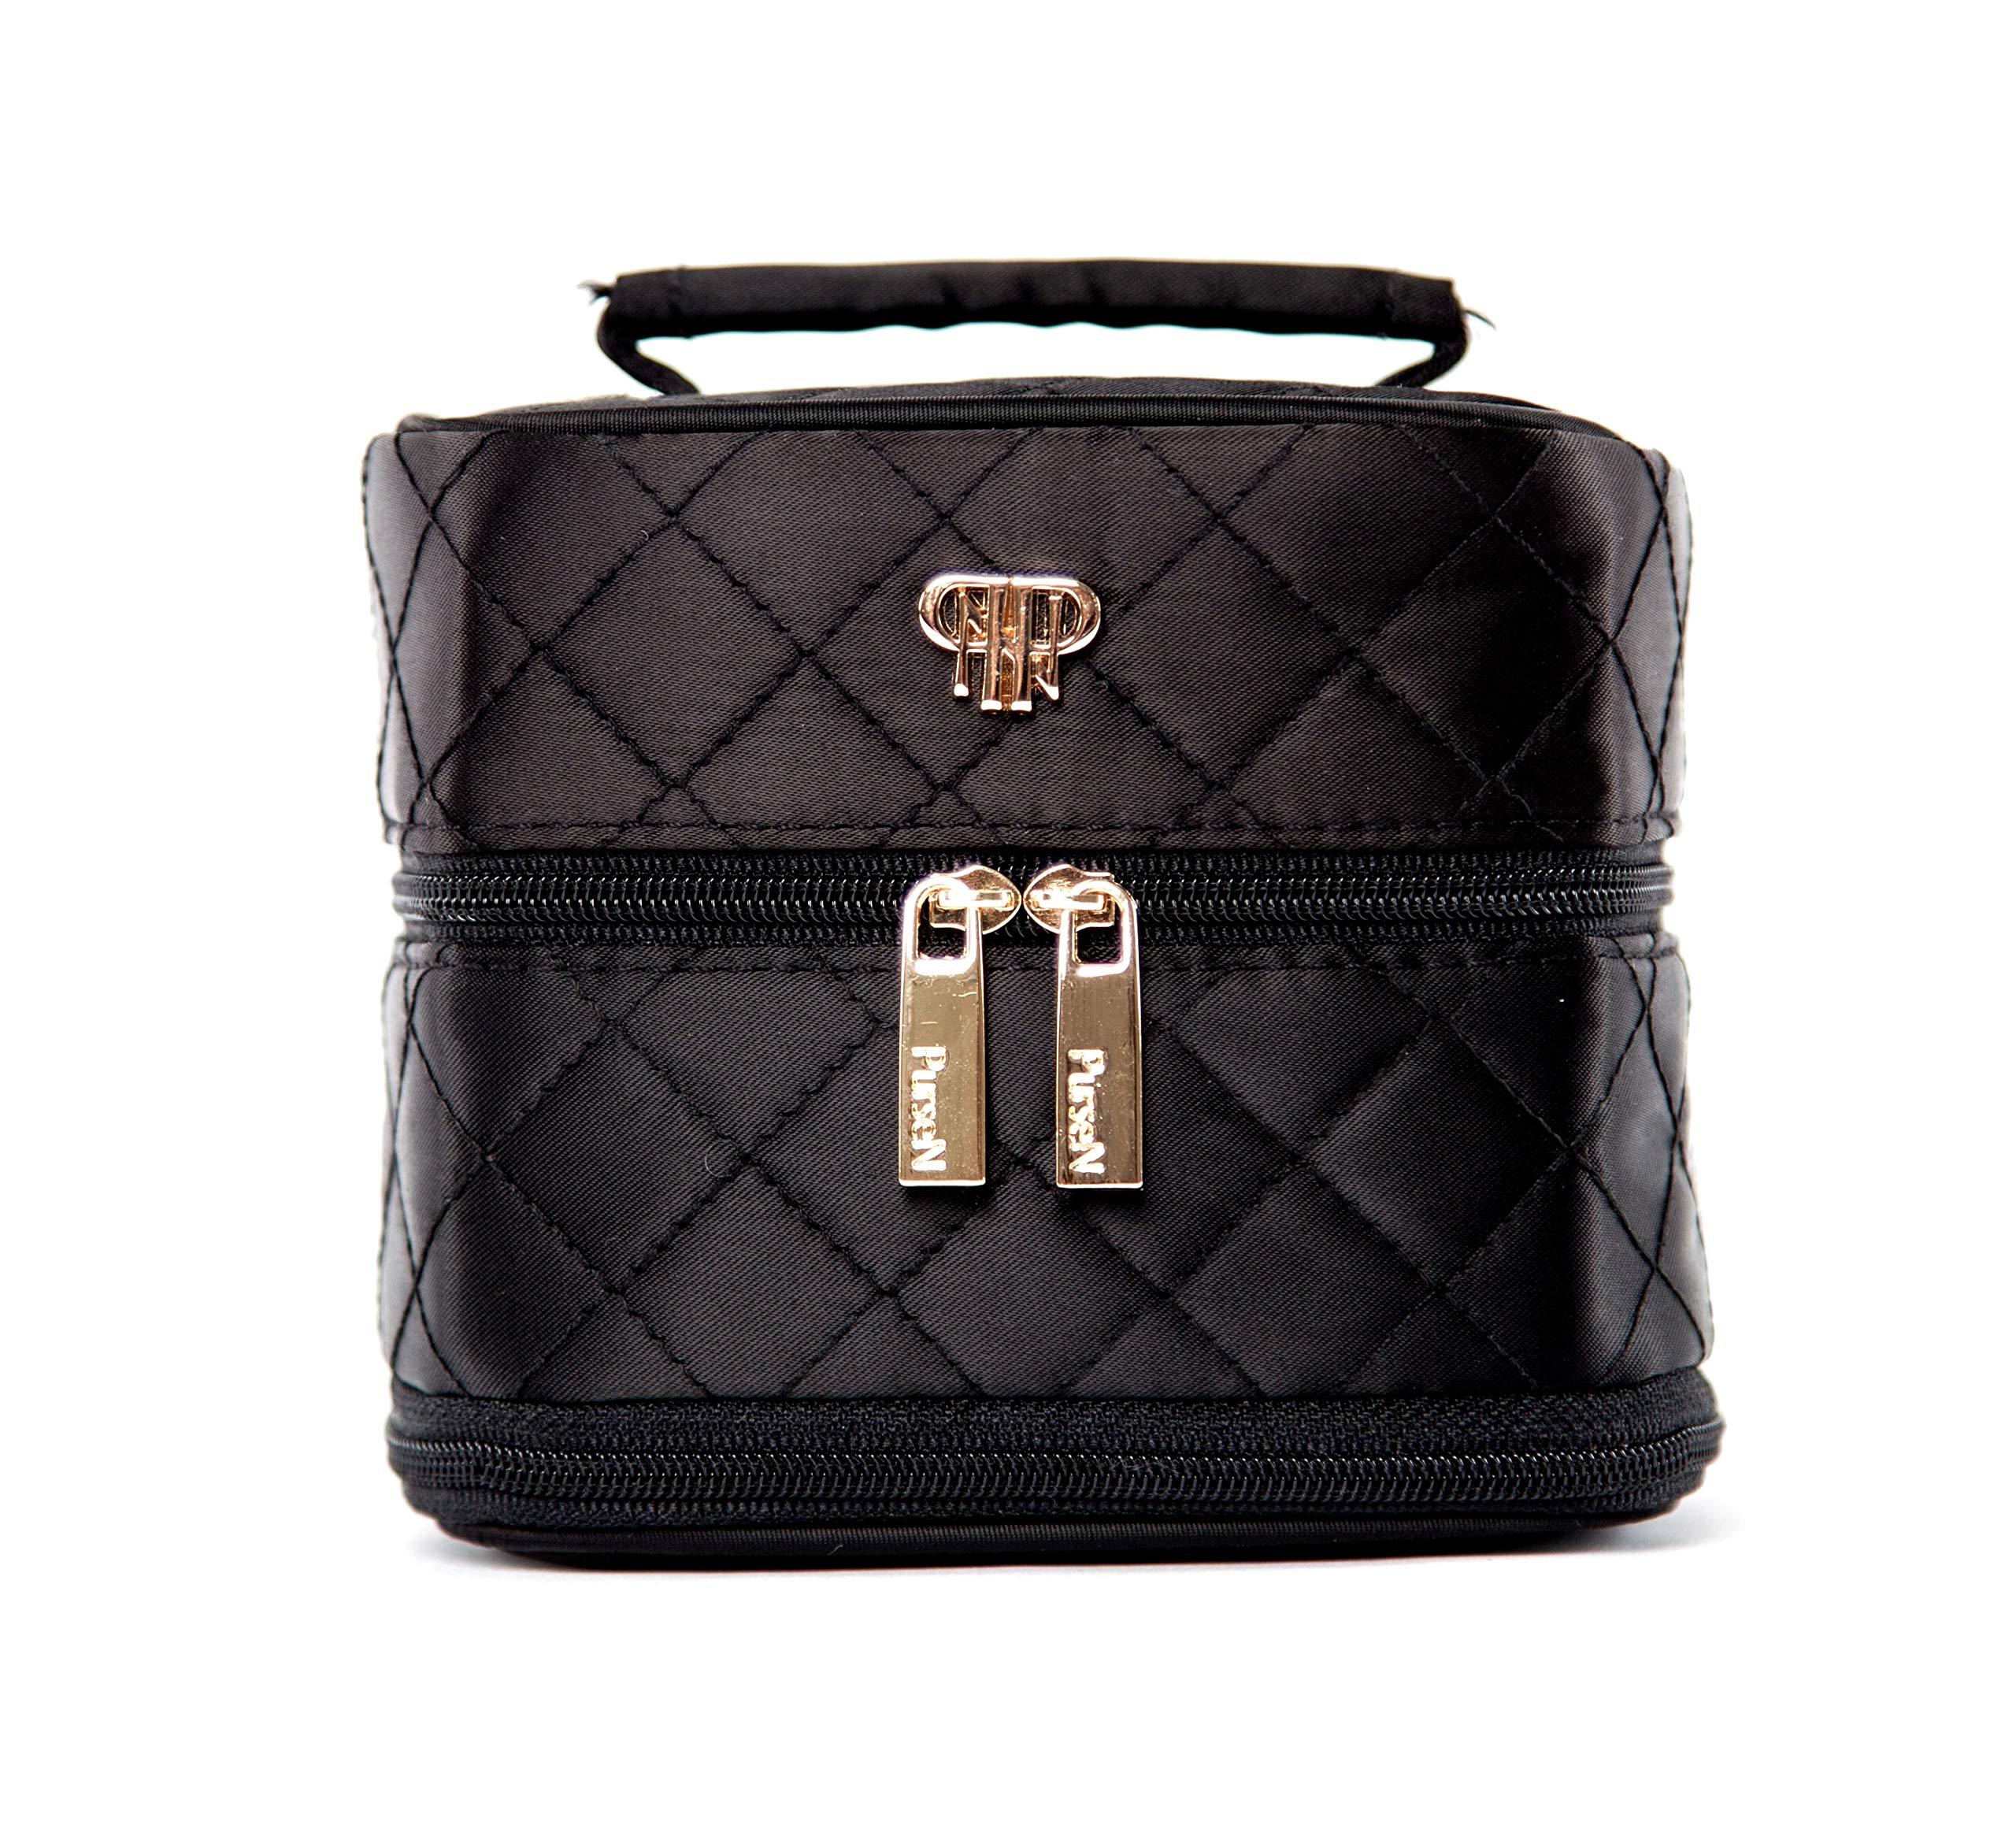 PurseN Tiara Small Weekender Jewelry Case (Quilted Elegance)